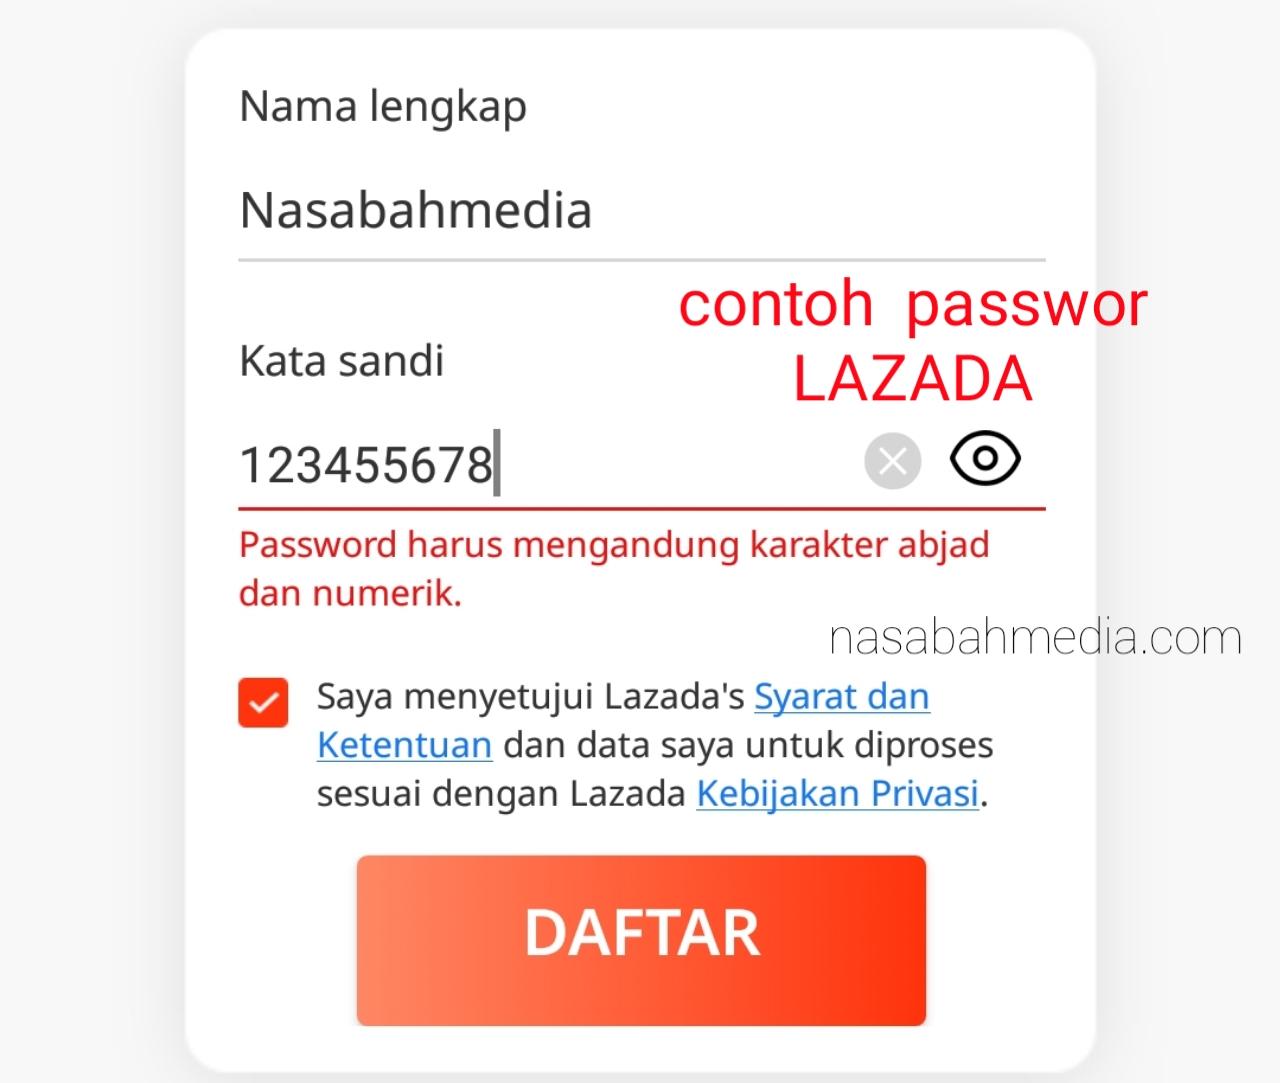 contoh password lazada